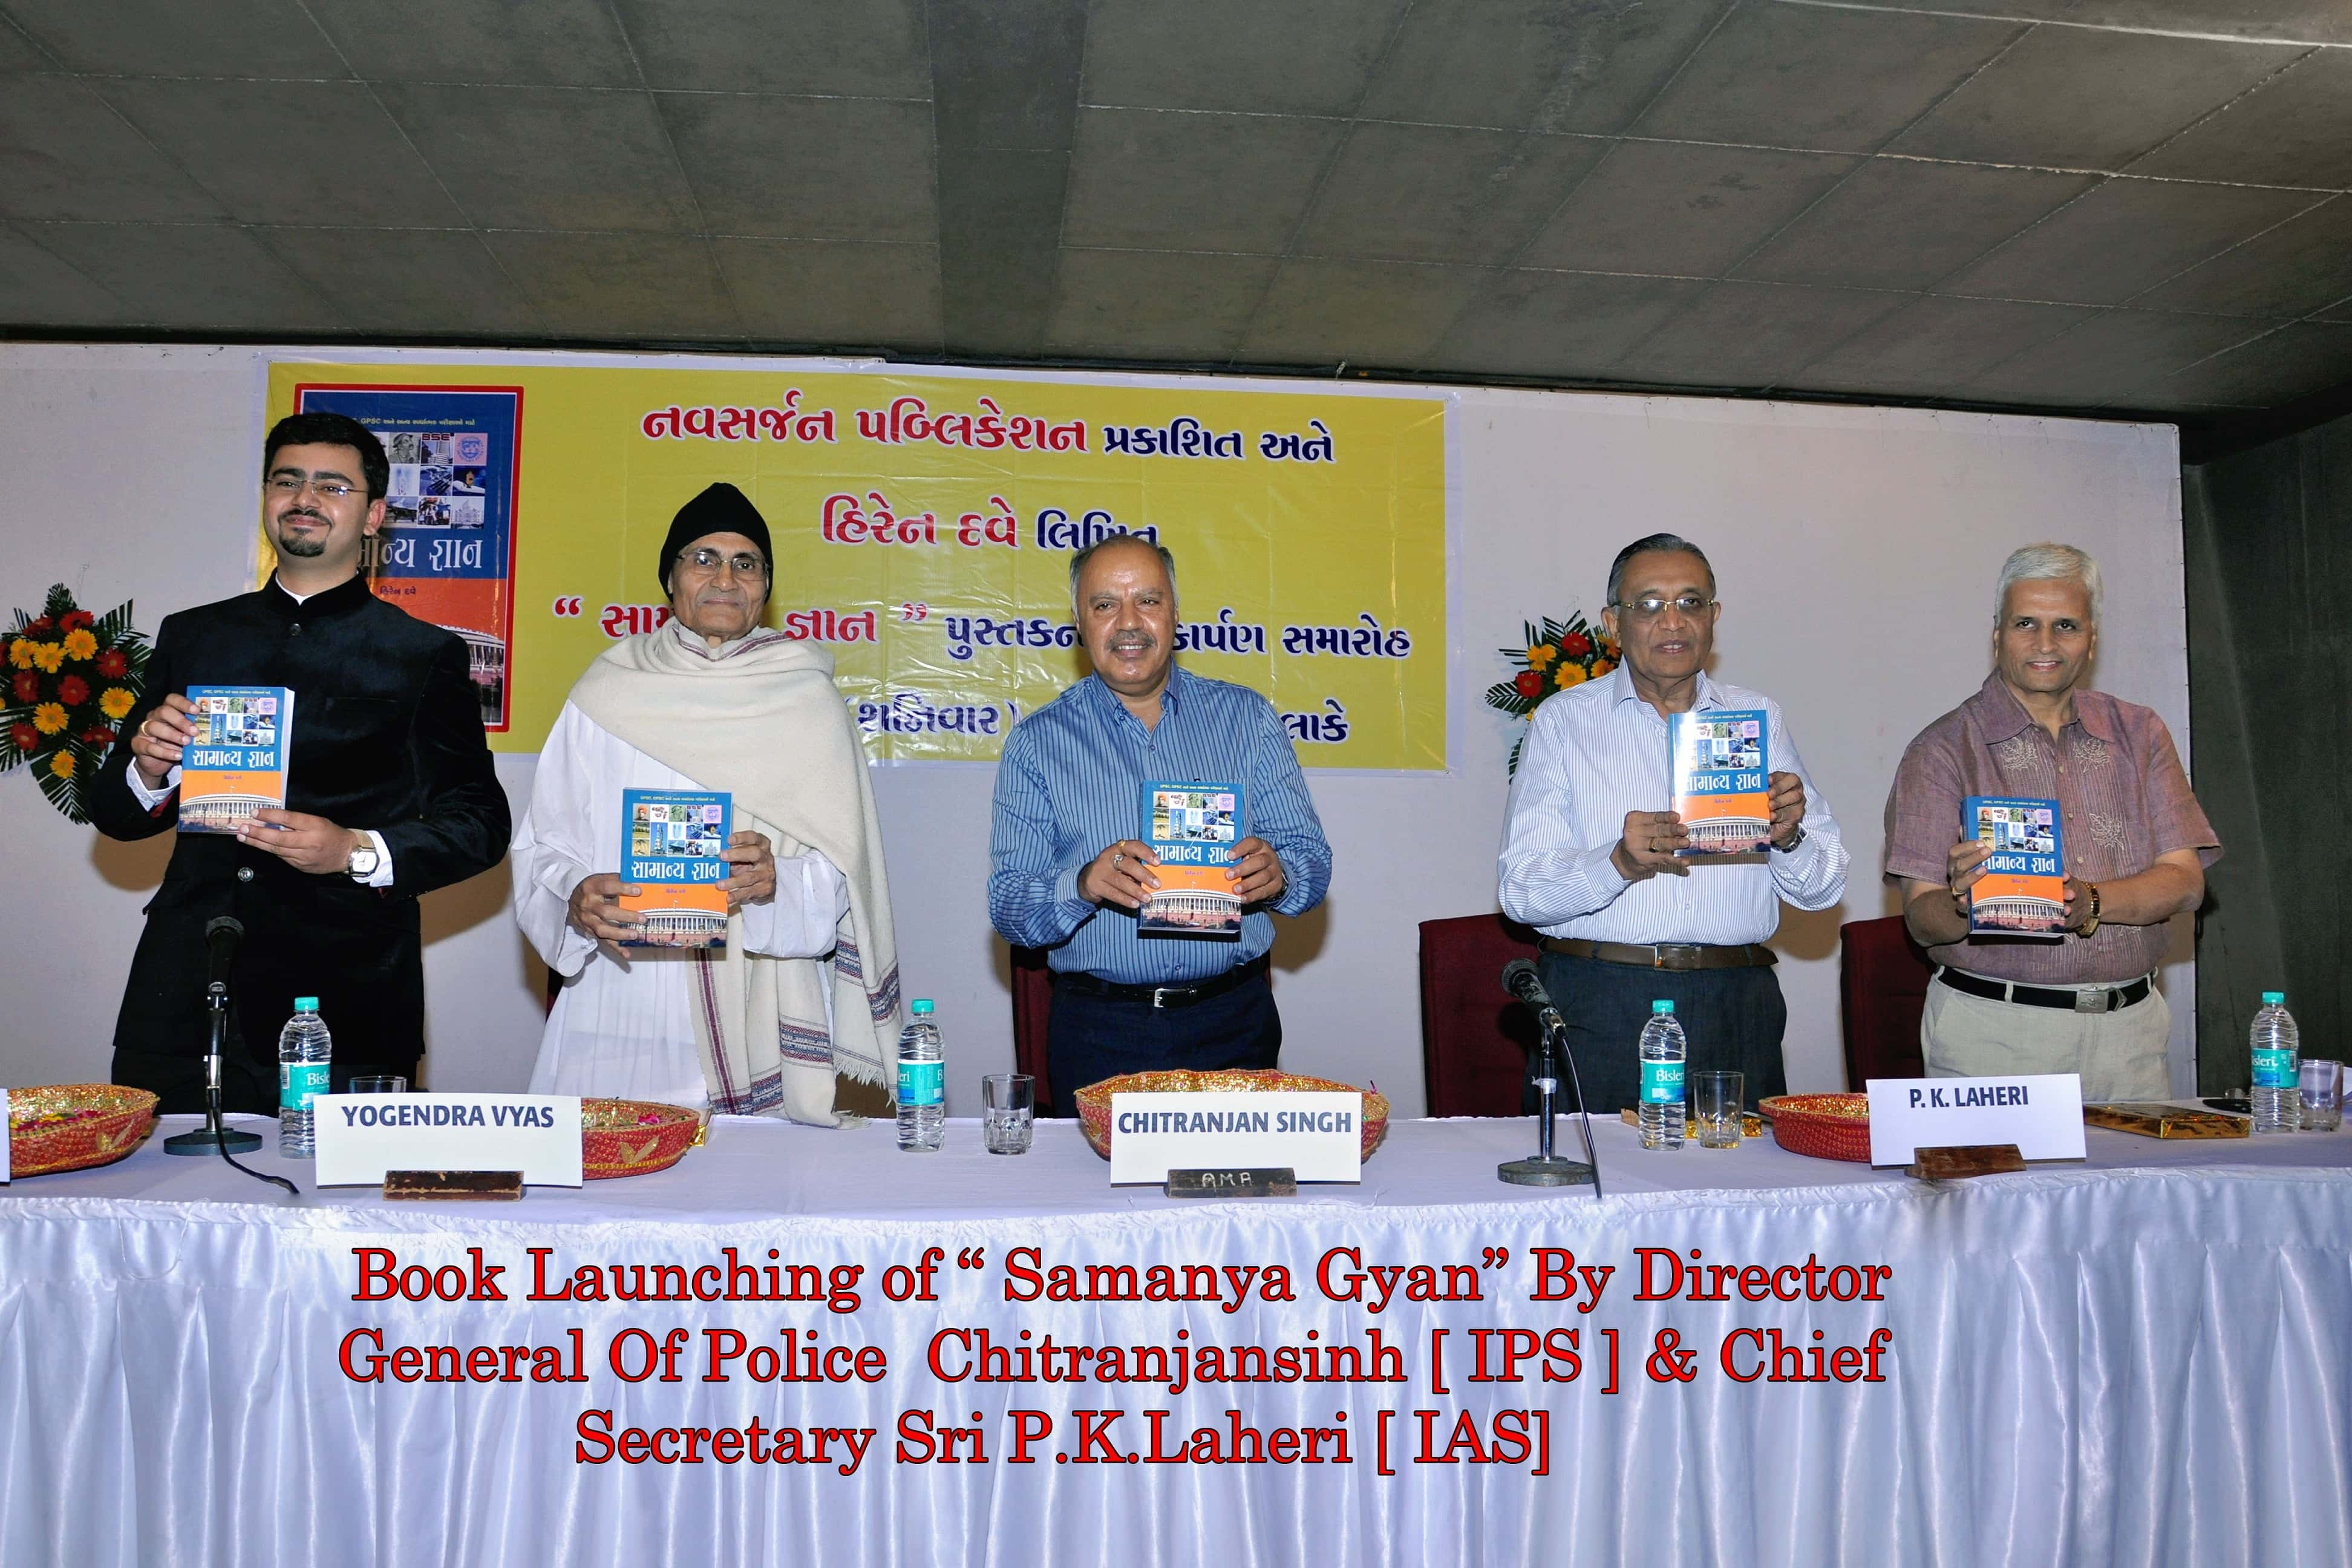 Laksh Career Academy Case Study